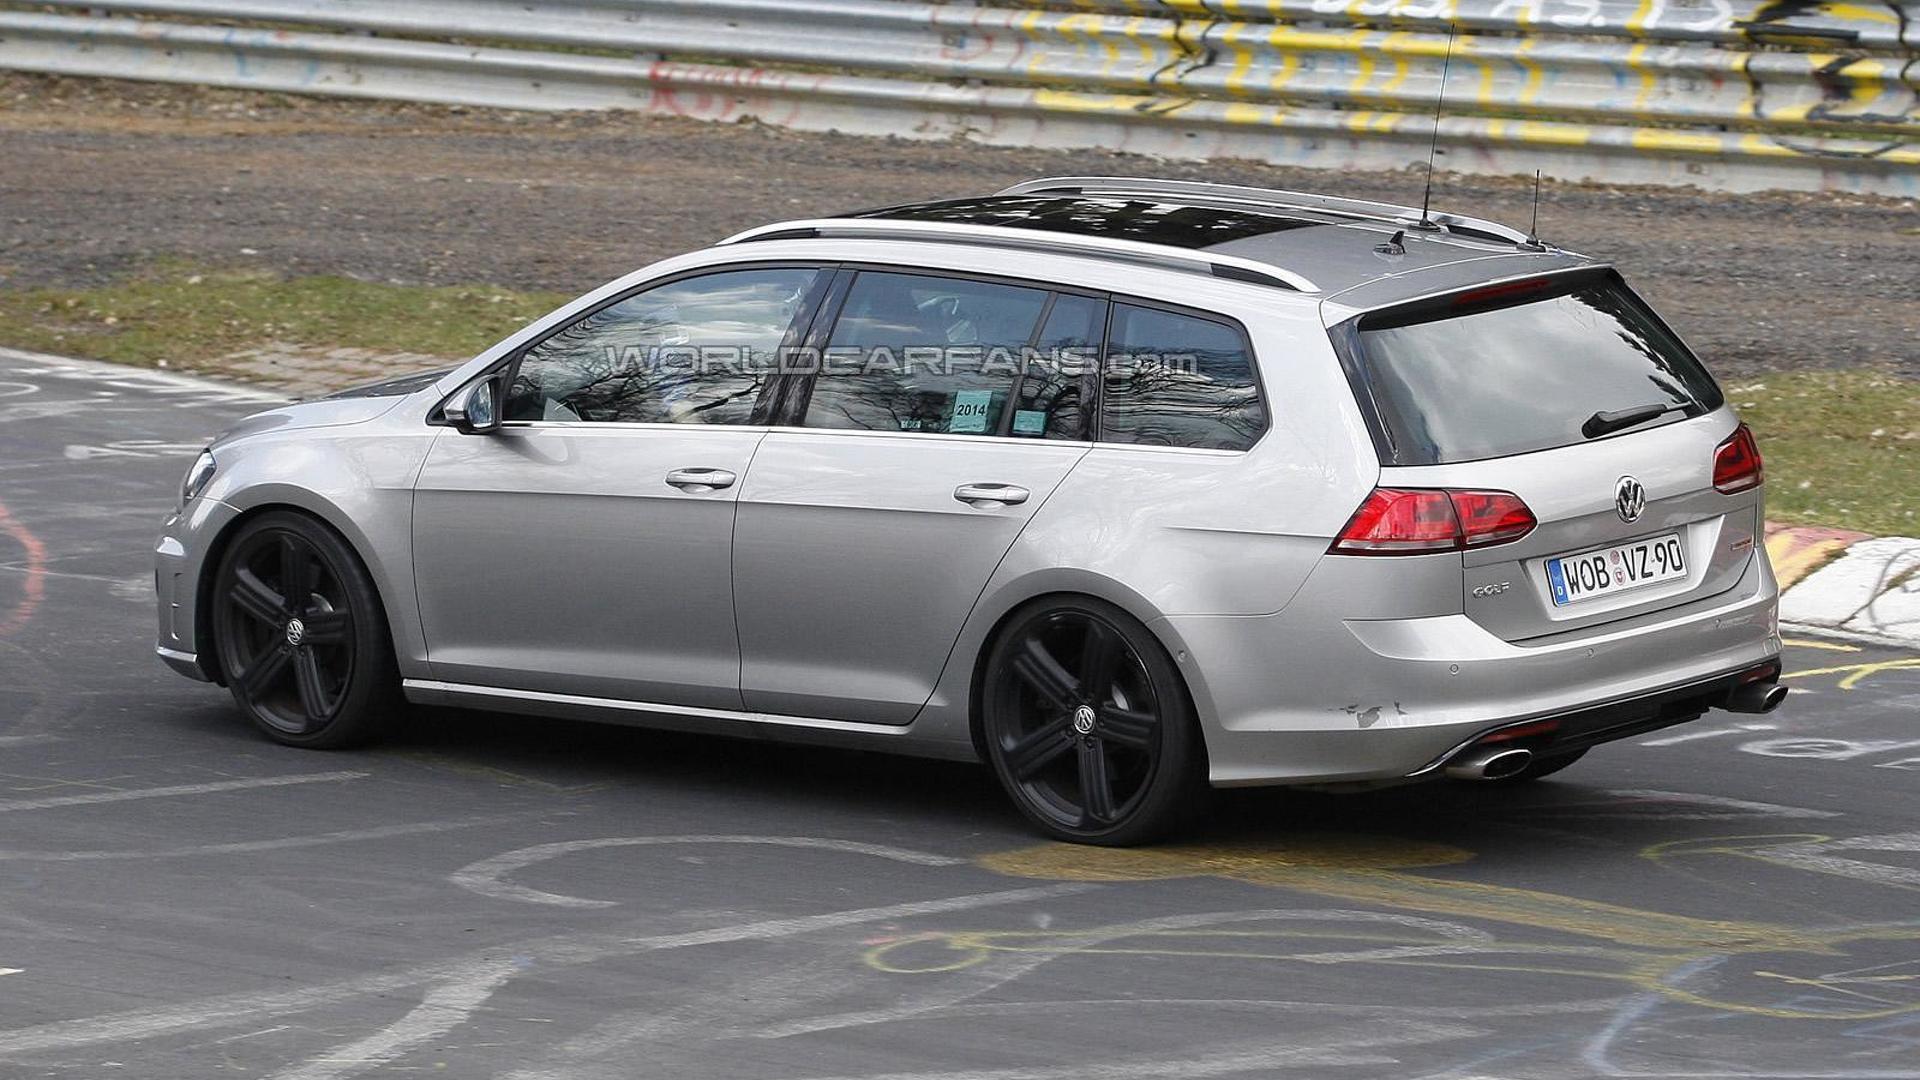 Volkswagen Golf R Variant returns in fresh spy shots